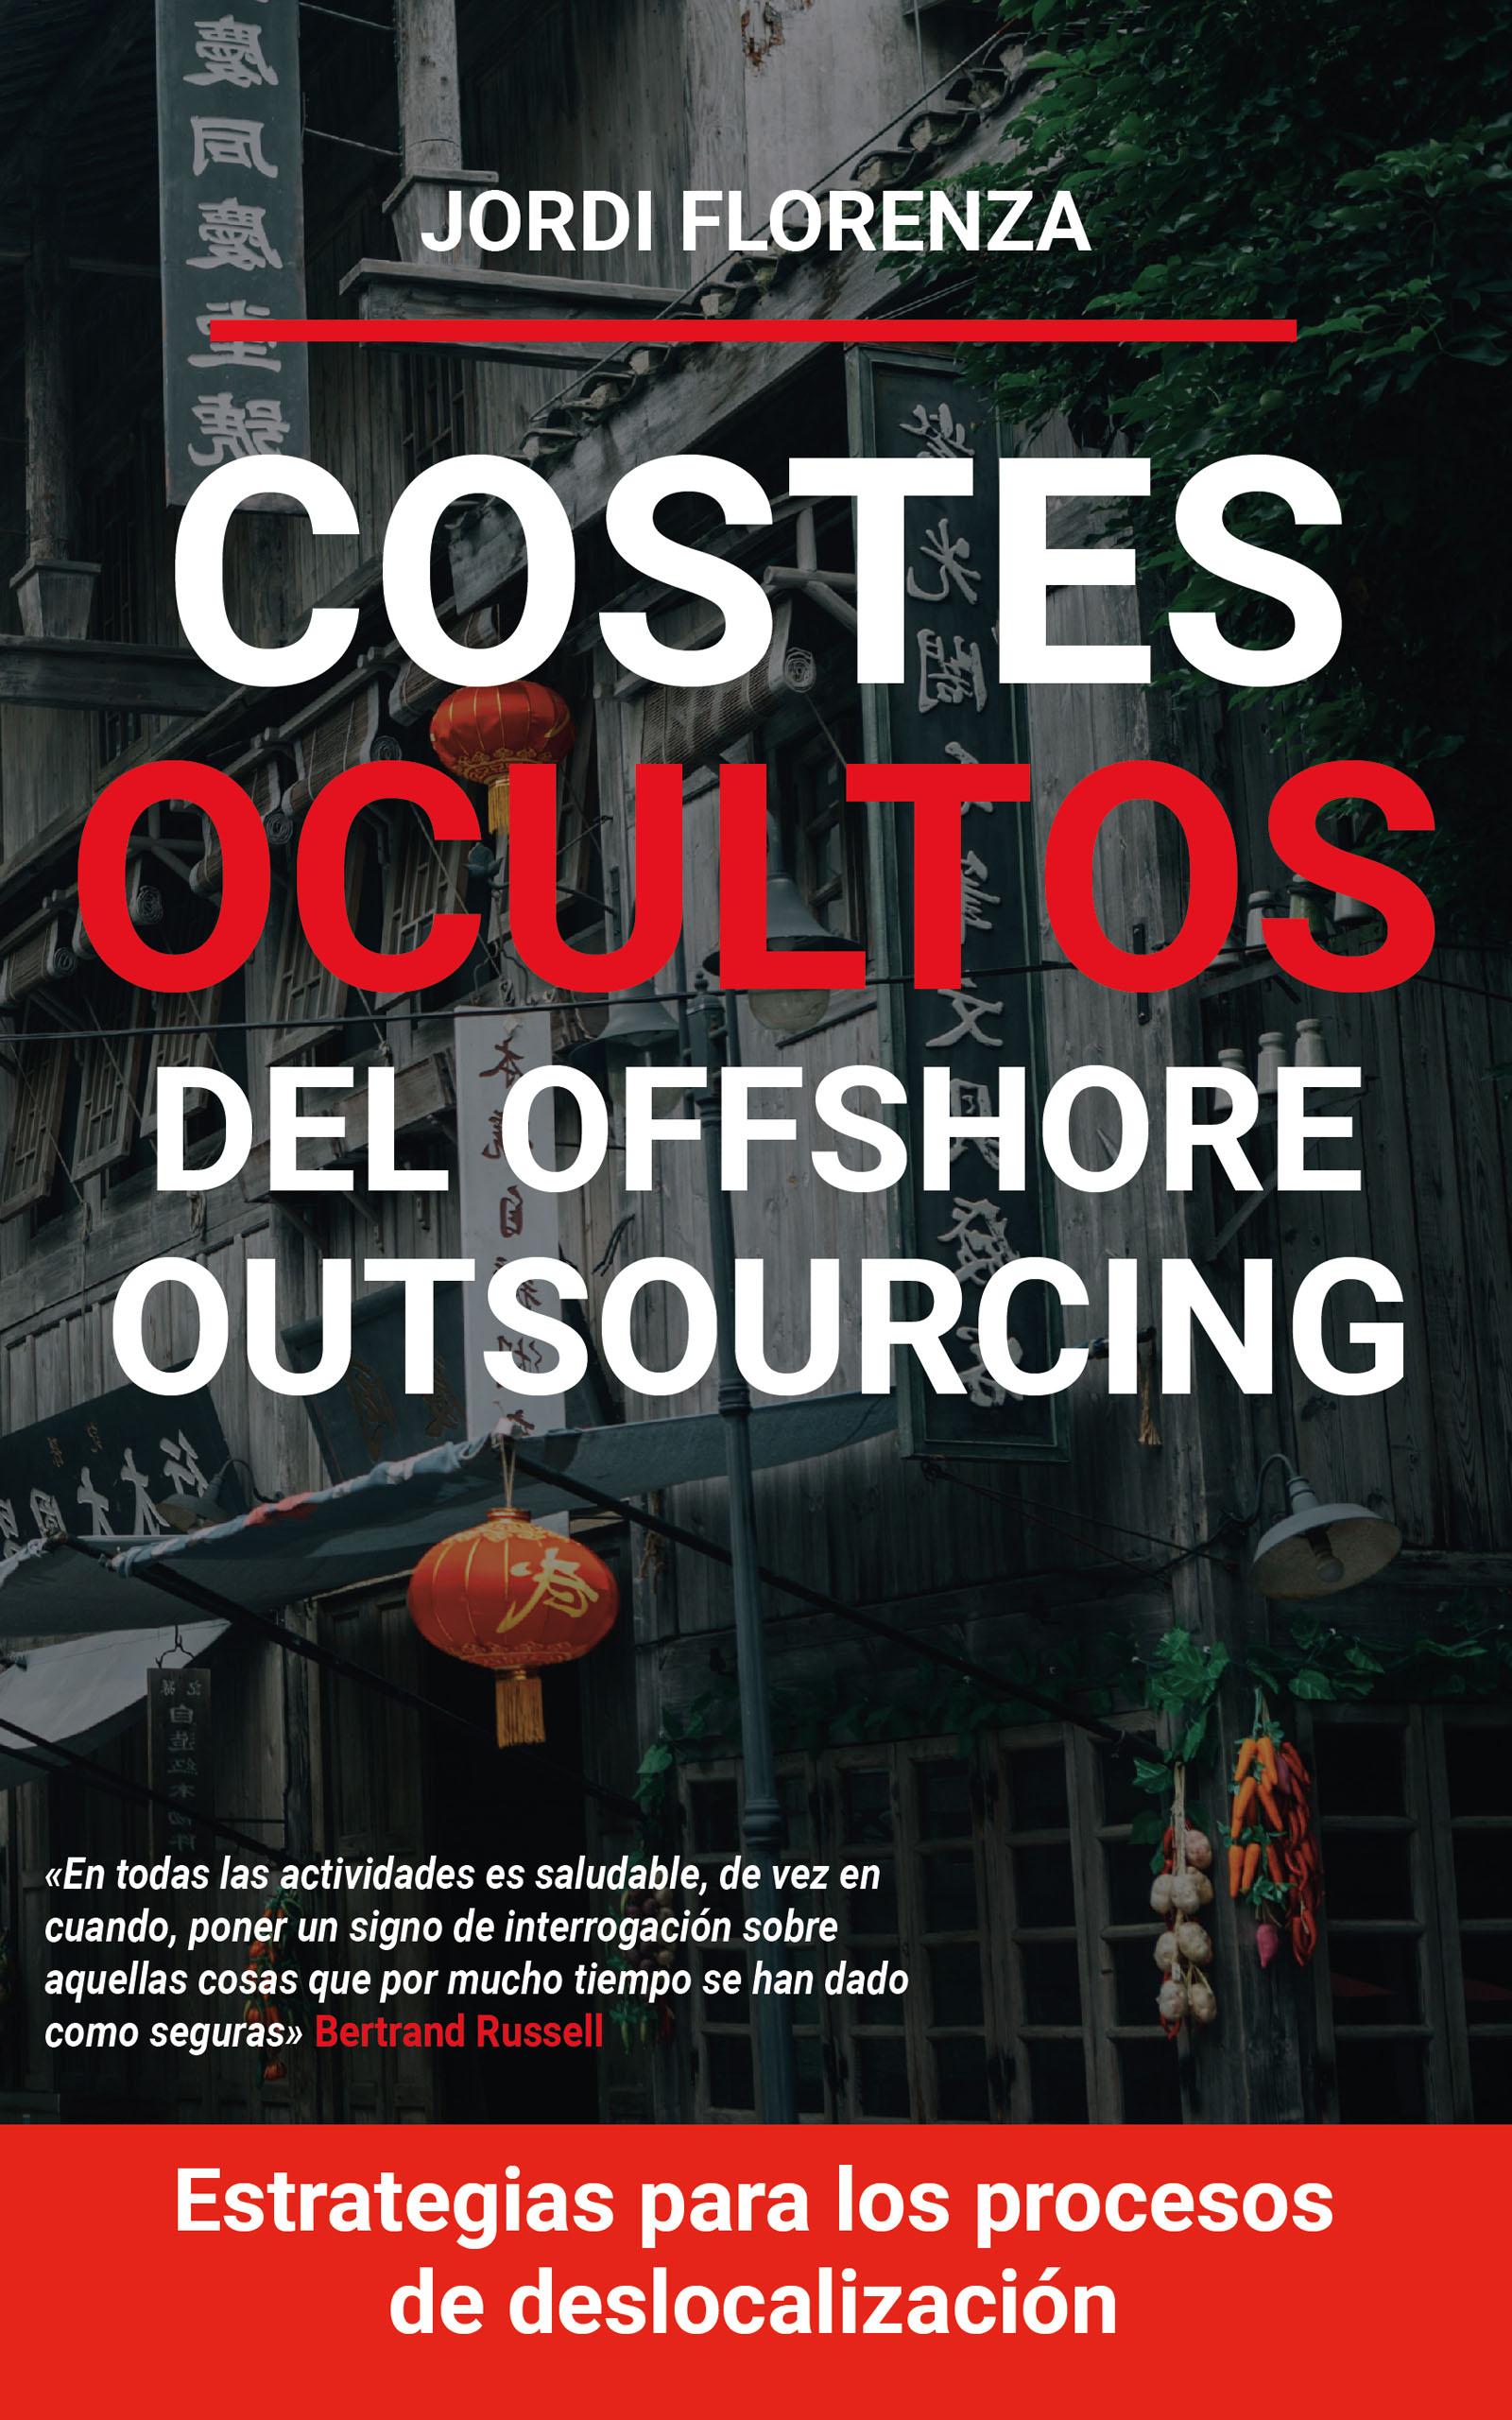 Costes ocultos del offshore outsourcing, de Jordi Florenza